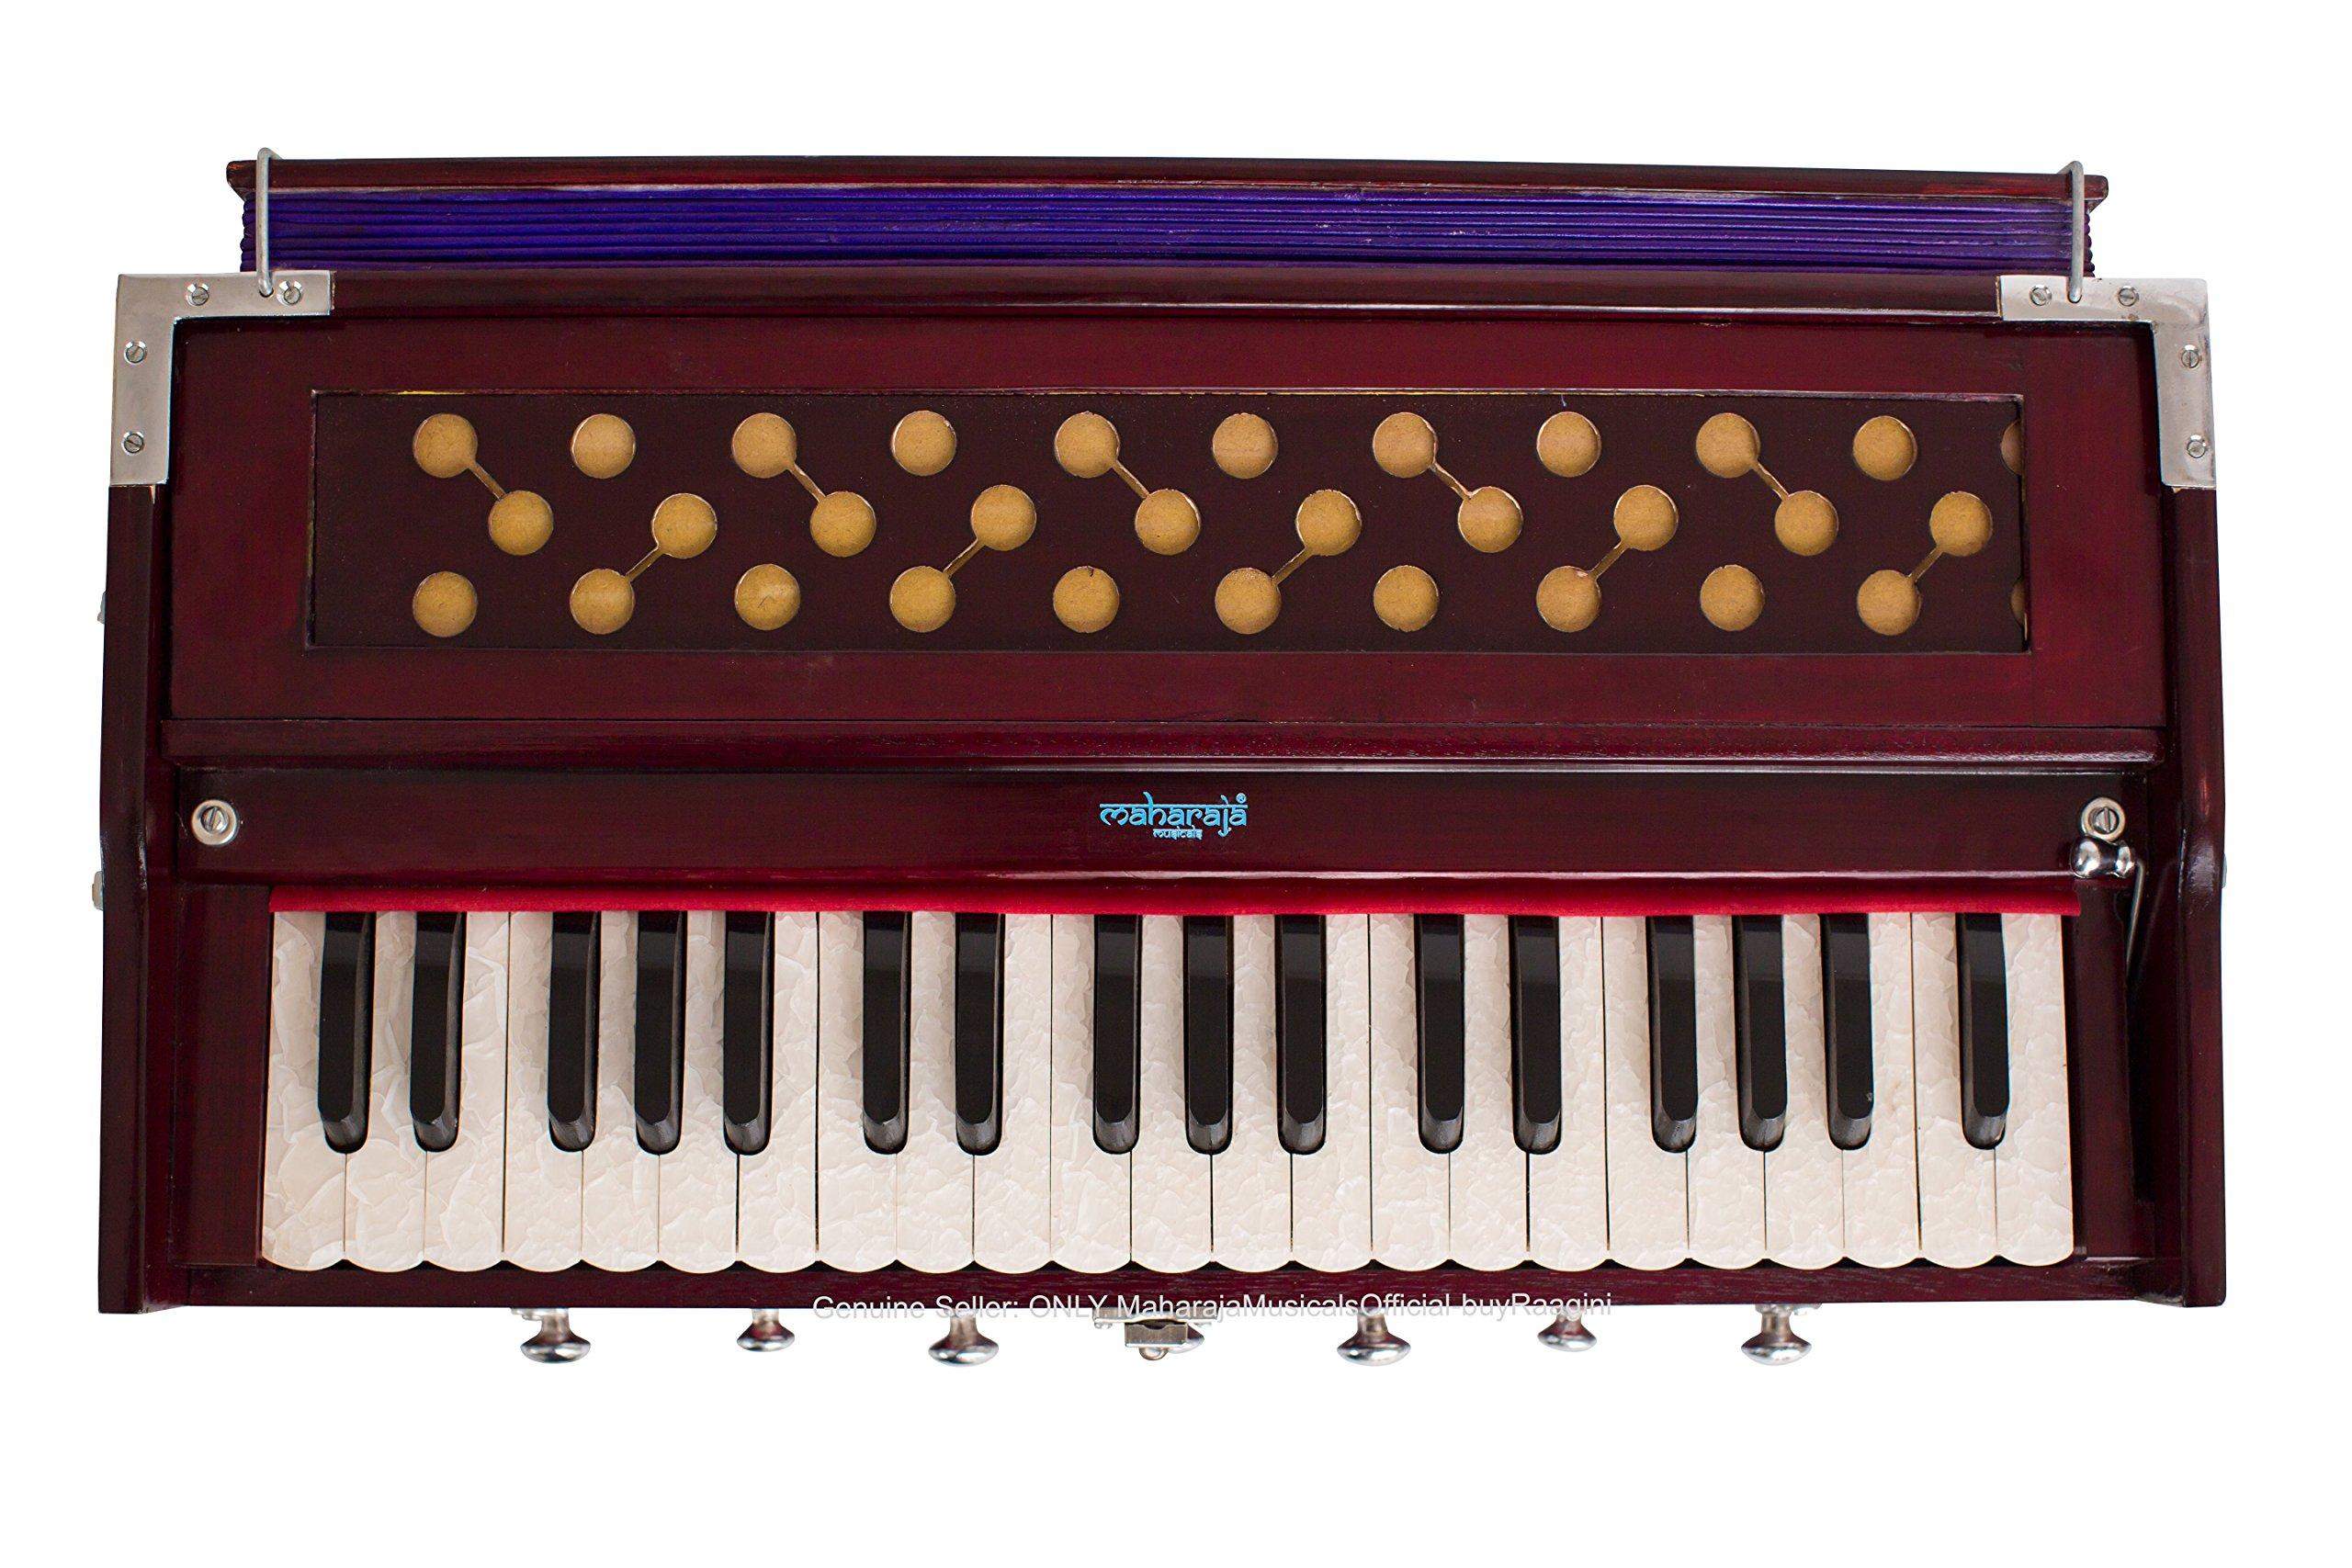 Harmonium #1, Maharaja Musicals, Handmade Harmonium, 3 1/4 Octave (Saptak), 7 Stop, Standing, Coupler, Multi Bellow, Padded Bag, Tuned A440, Dark Mahogany Color, PDI-DB